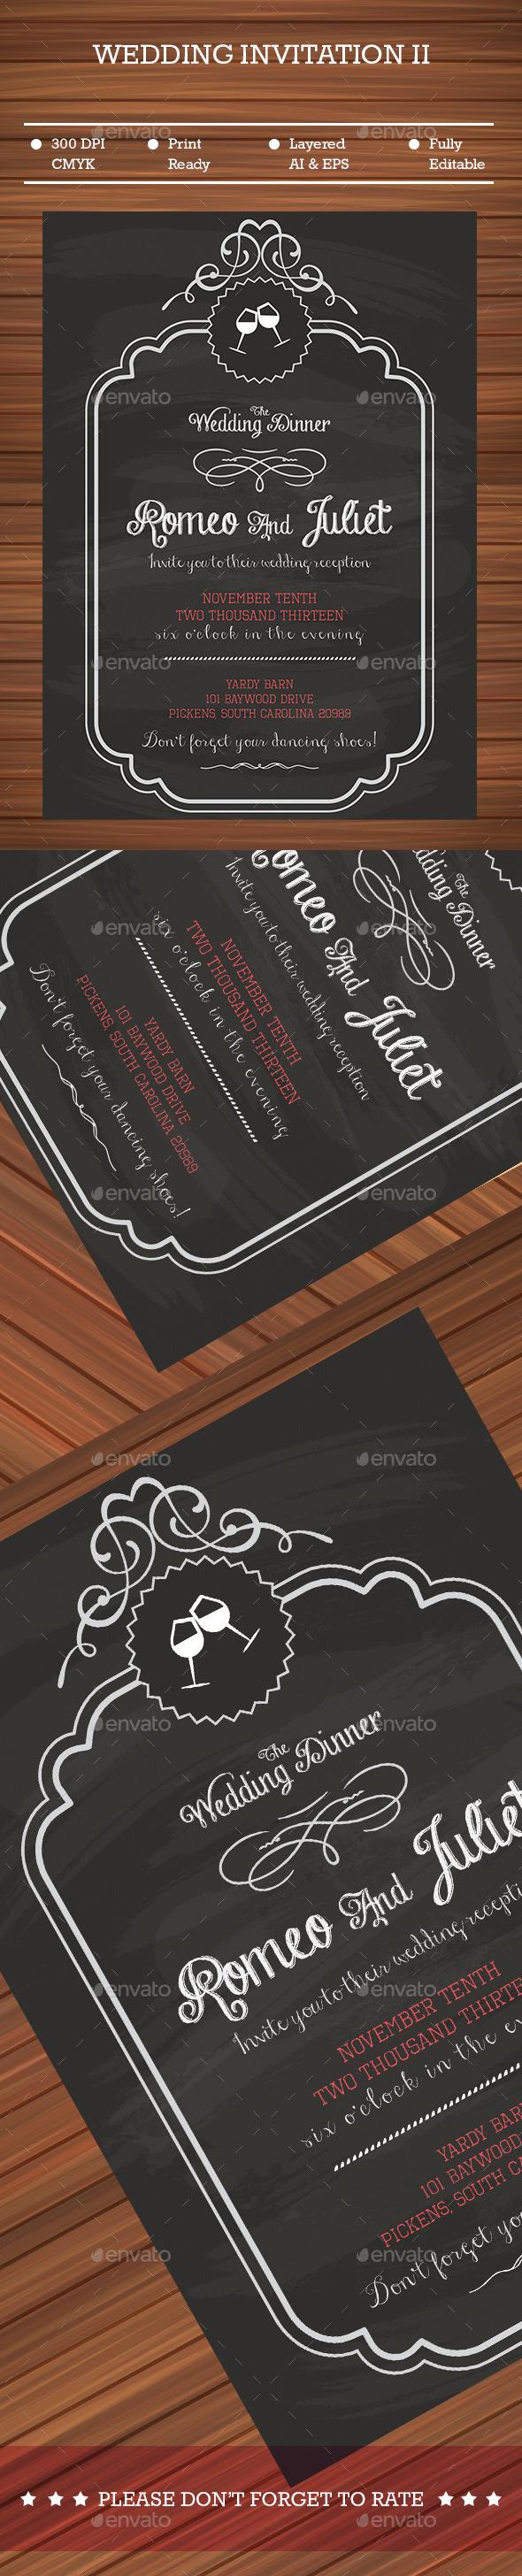 Black Wedding Invitation - Cards & Invites Print Templates